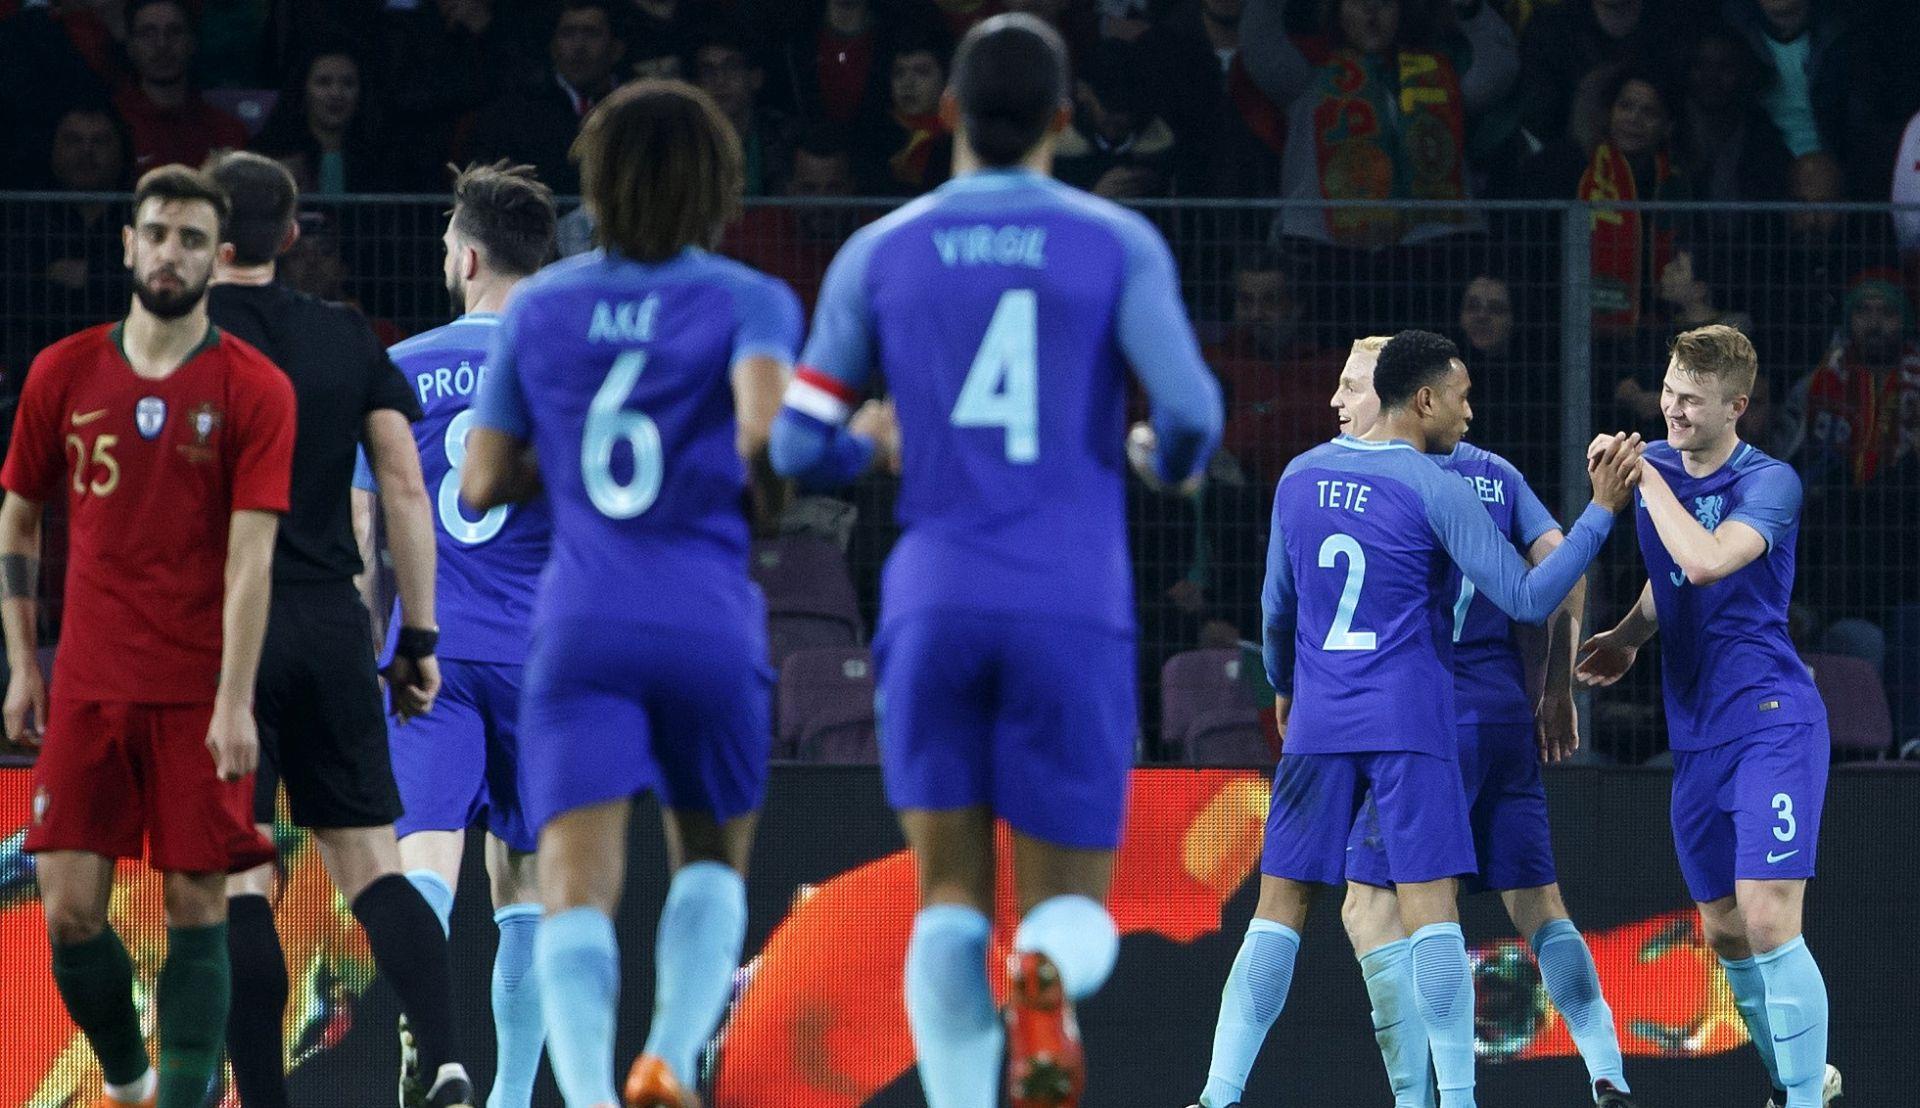 VIDEO: Nizozemska svladala europske prvake